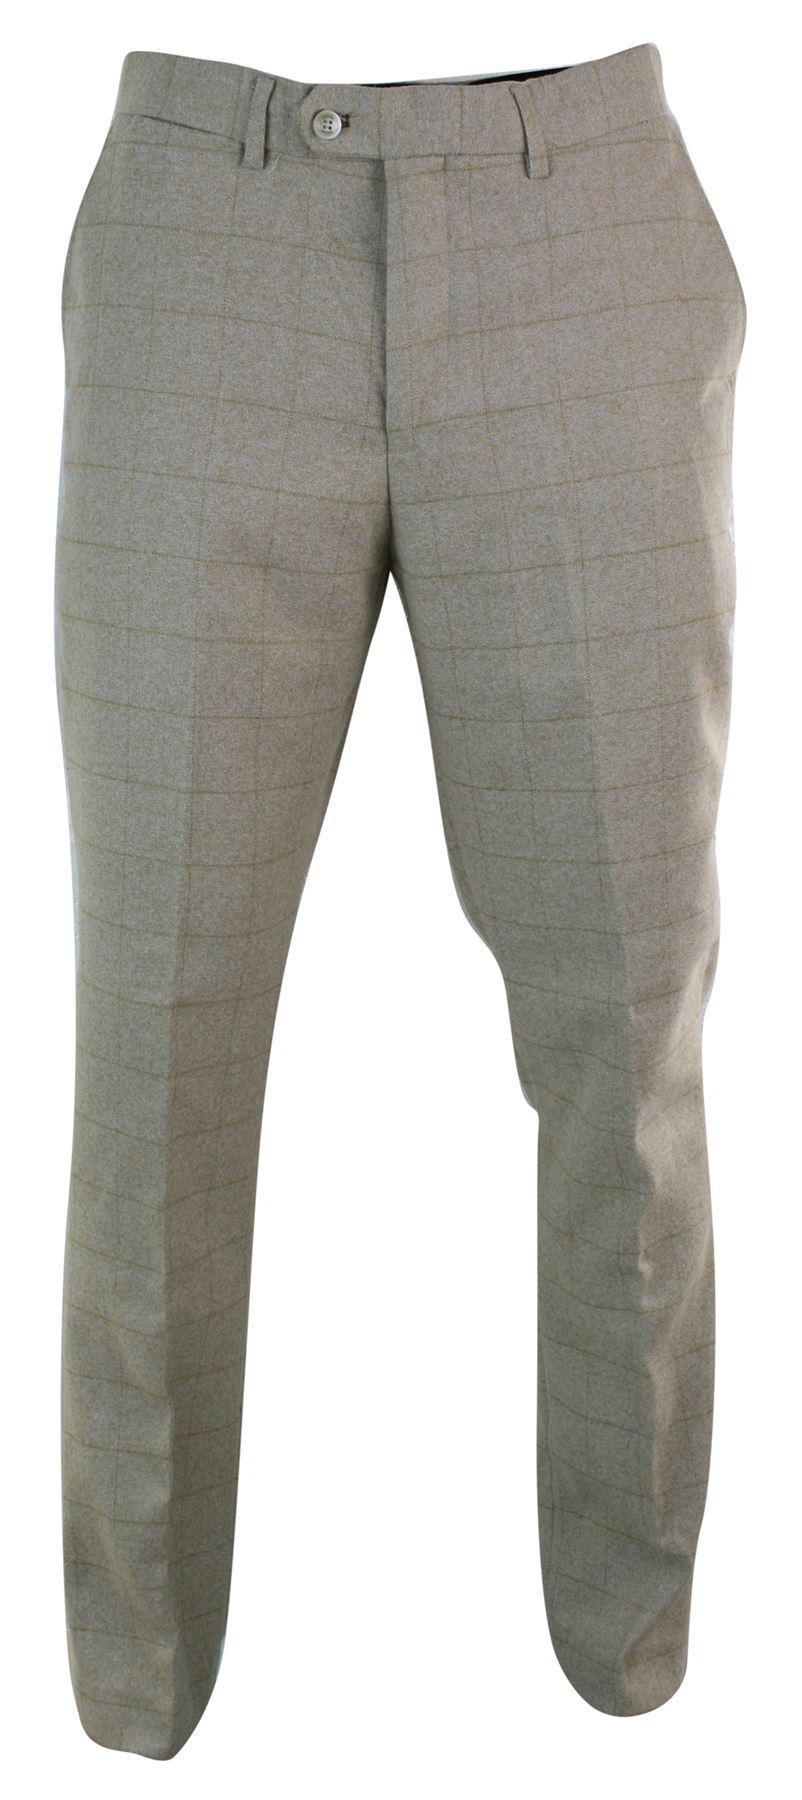 Mens Tweed Check Herringbone Peaky Blinders Trousers Tailored Fit Regular Retro